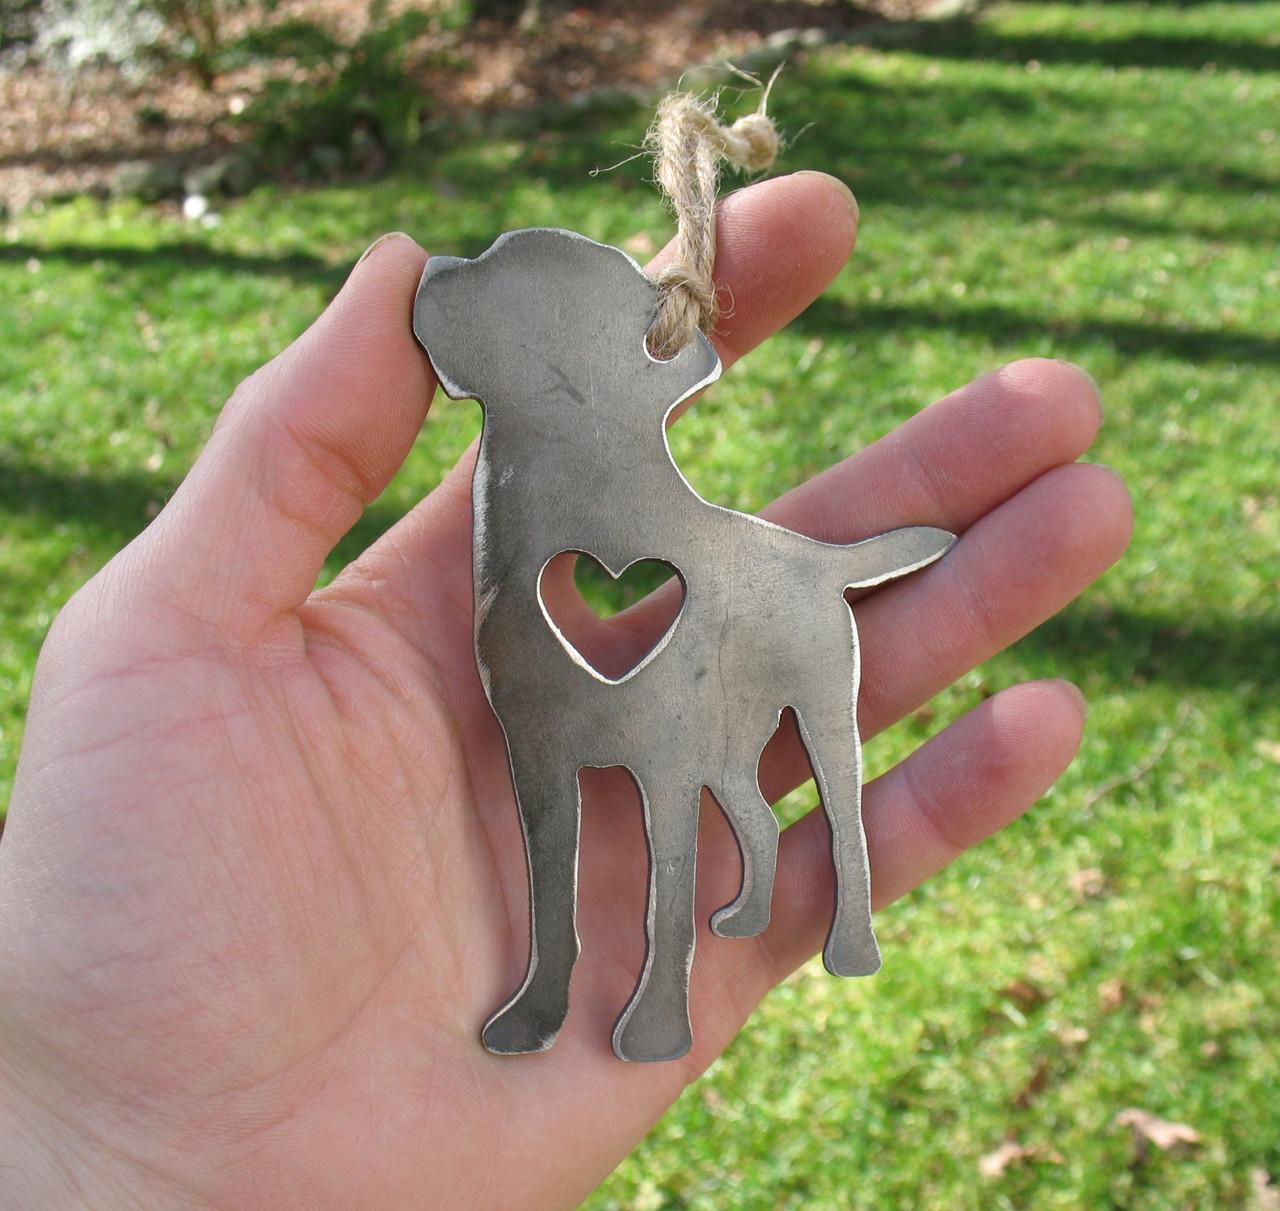 Labrador Retriever Dog Ornament 2 - Metal Dog Easter Basket Gift for Him Her - Pet Lover Memorial Ornament - Pet Loss Dog Remembrance Gift